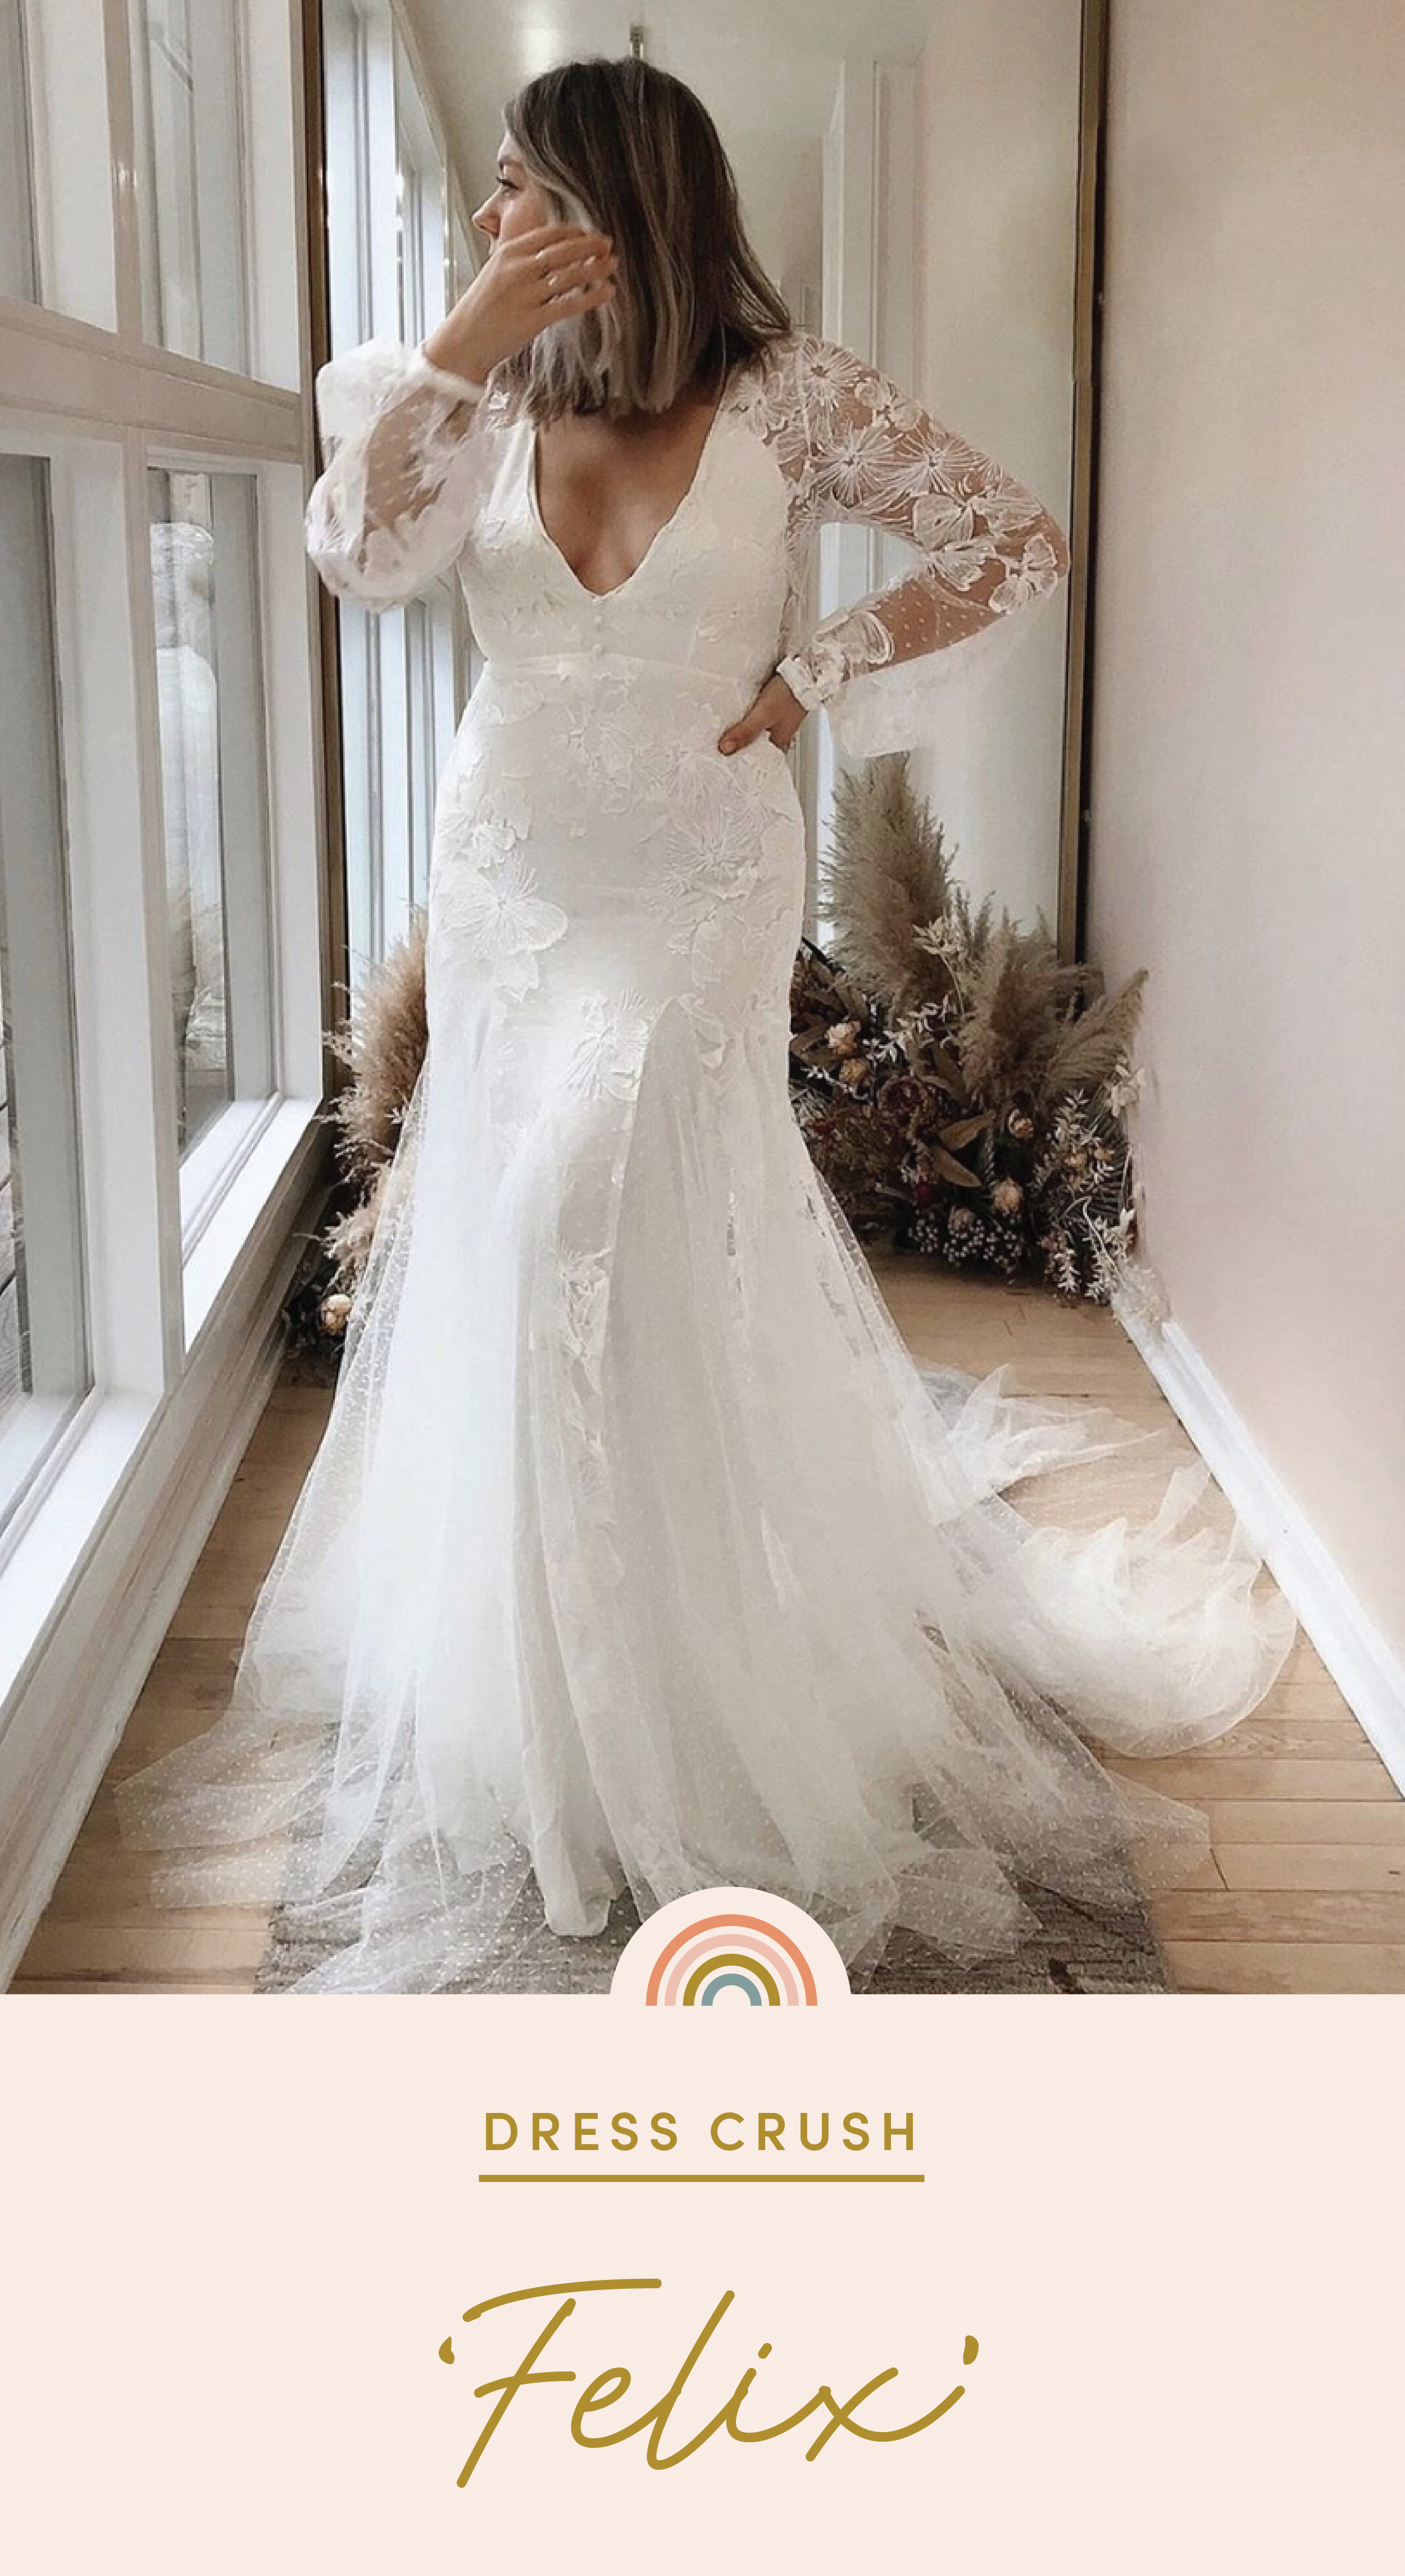 Alexandra Grecco Felix Wedding Gown For Curvy Brides At Lovely Bride Curvy Wedding Dress Wedding Dress Styles Plain Wedding Dress [ 4584 x 2501 Pixel ]